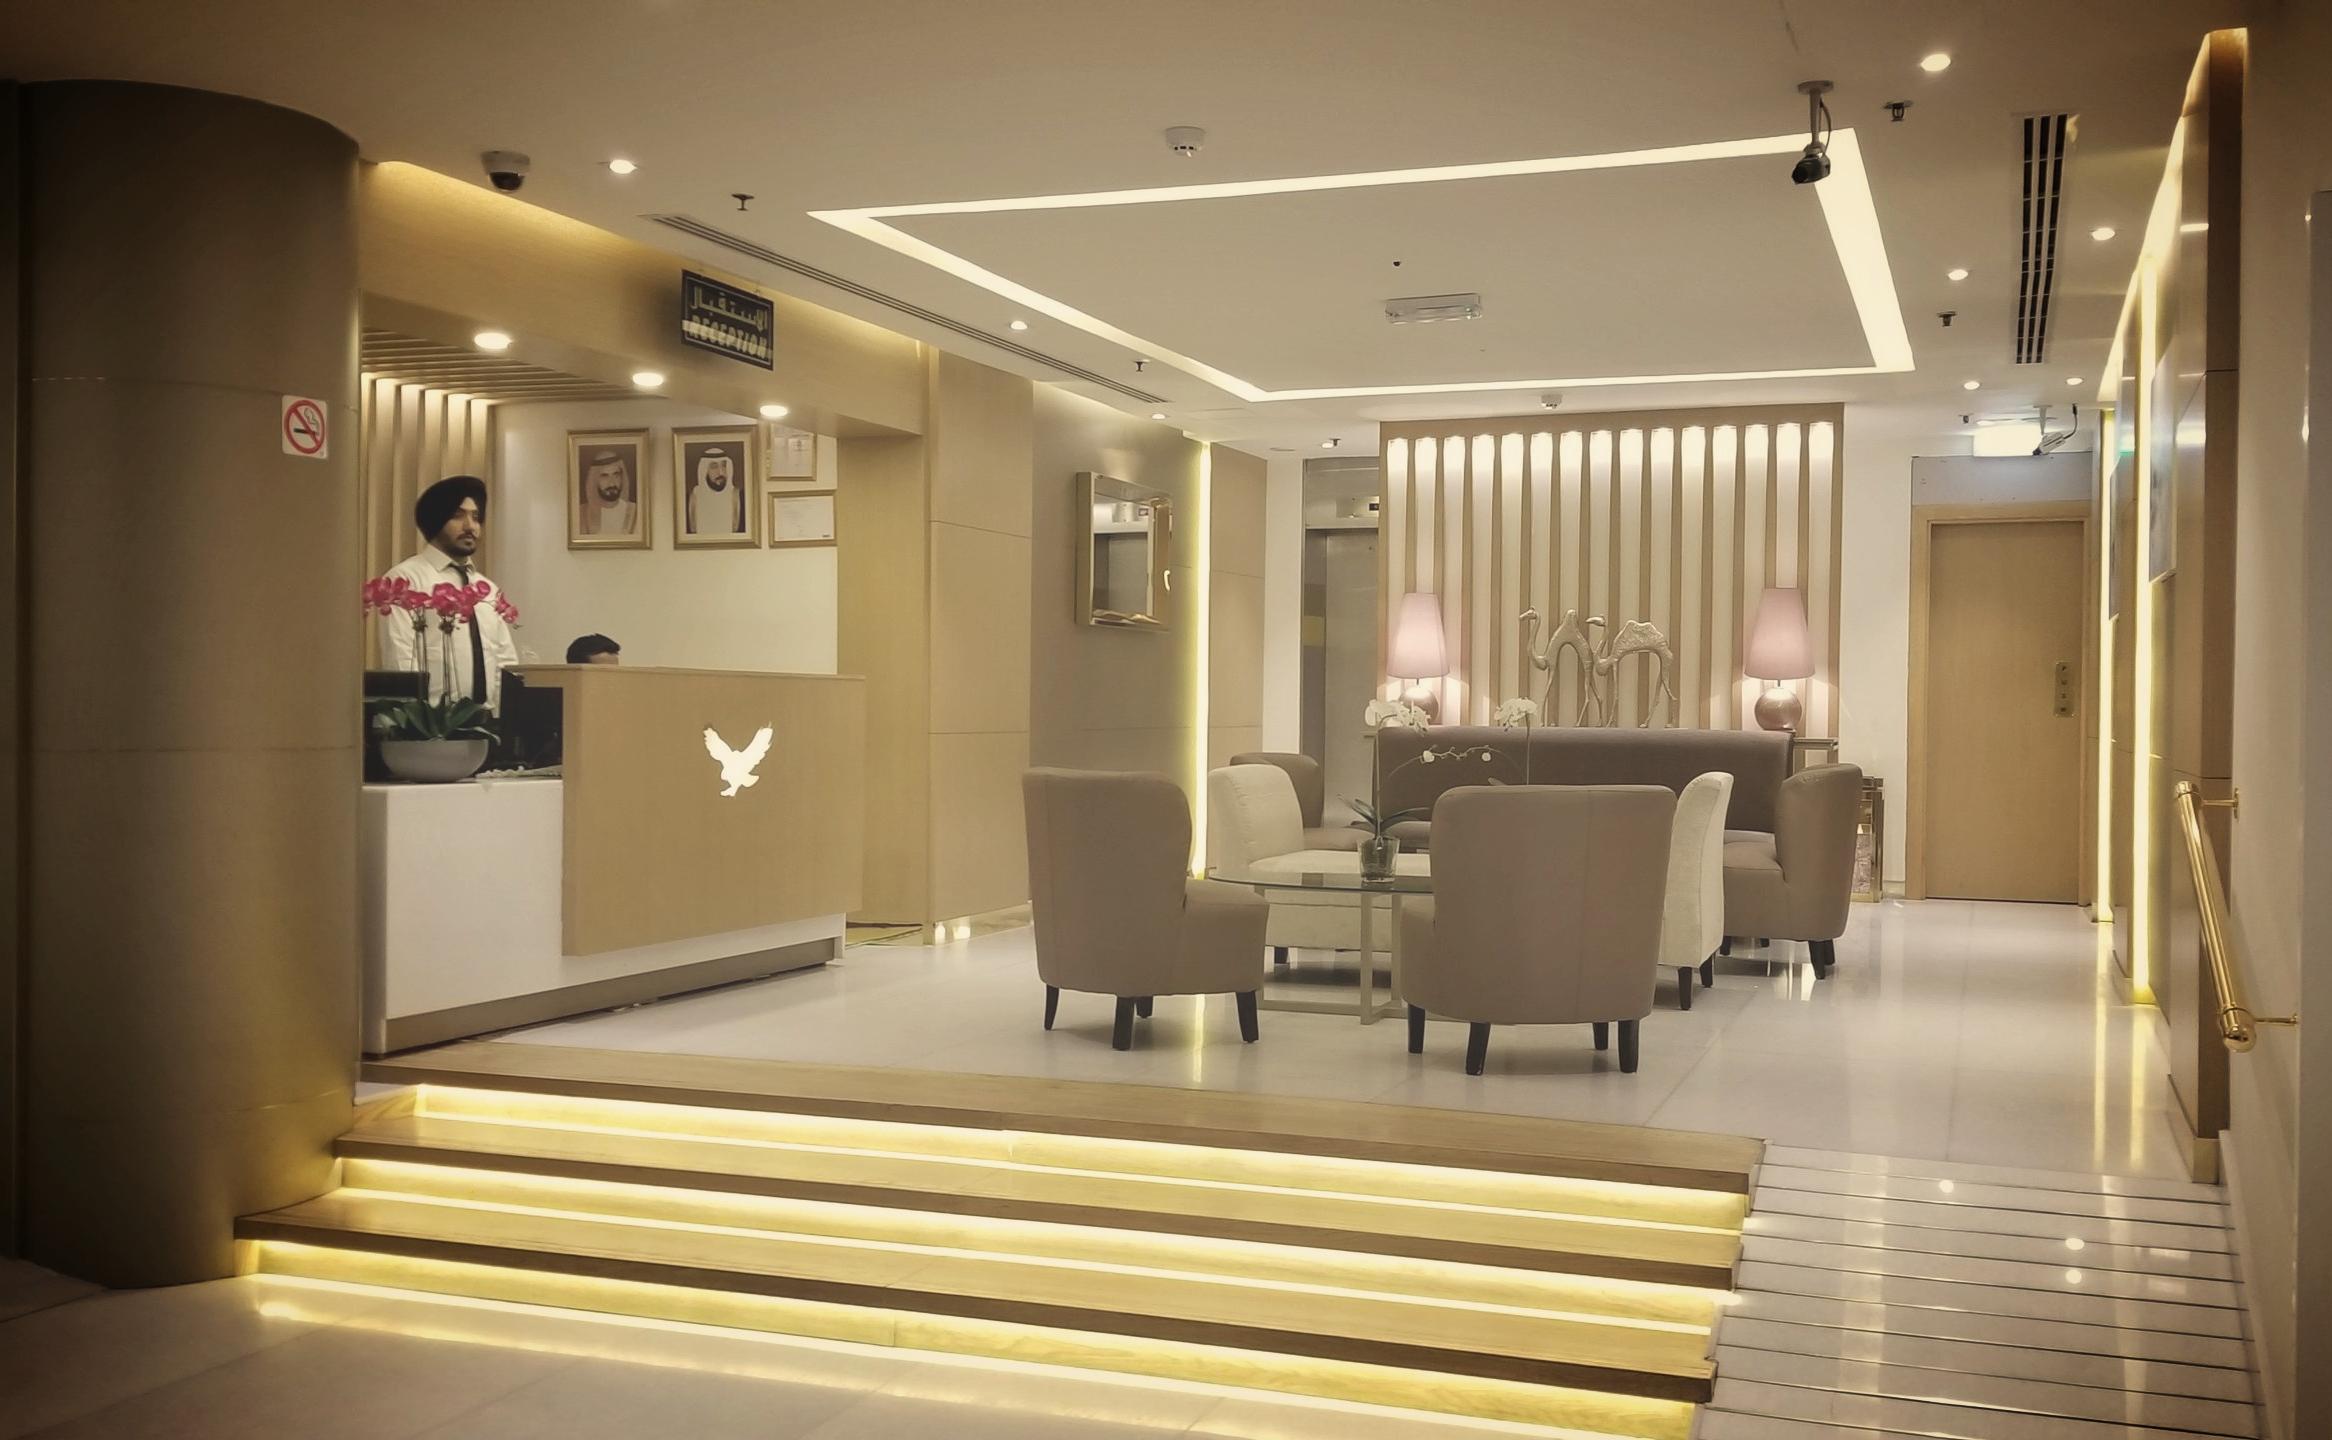 Royal Falcon Hotel- Diera, Dubai.